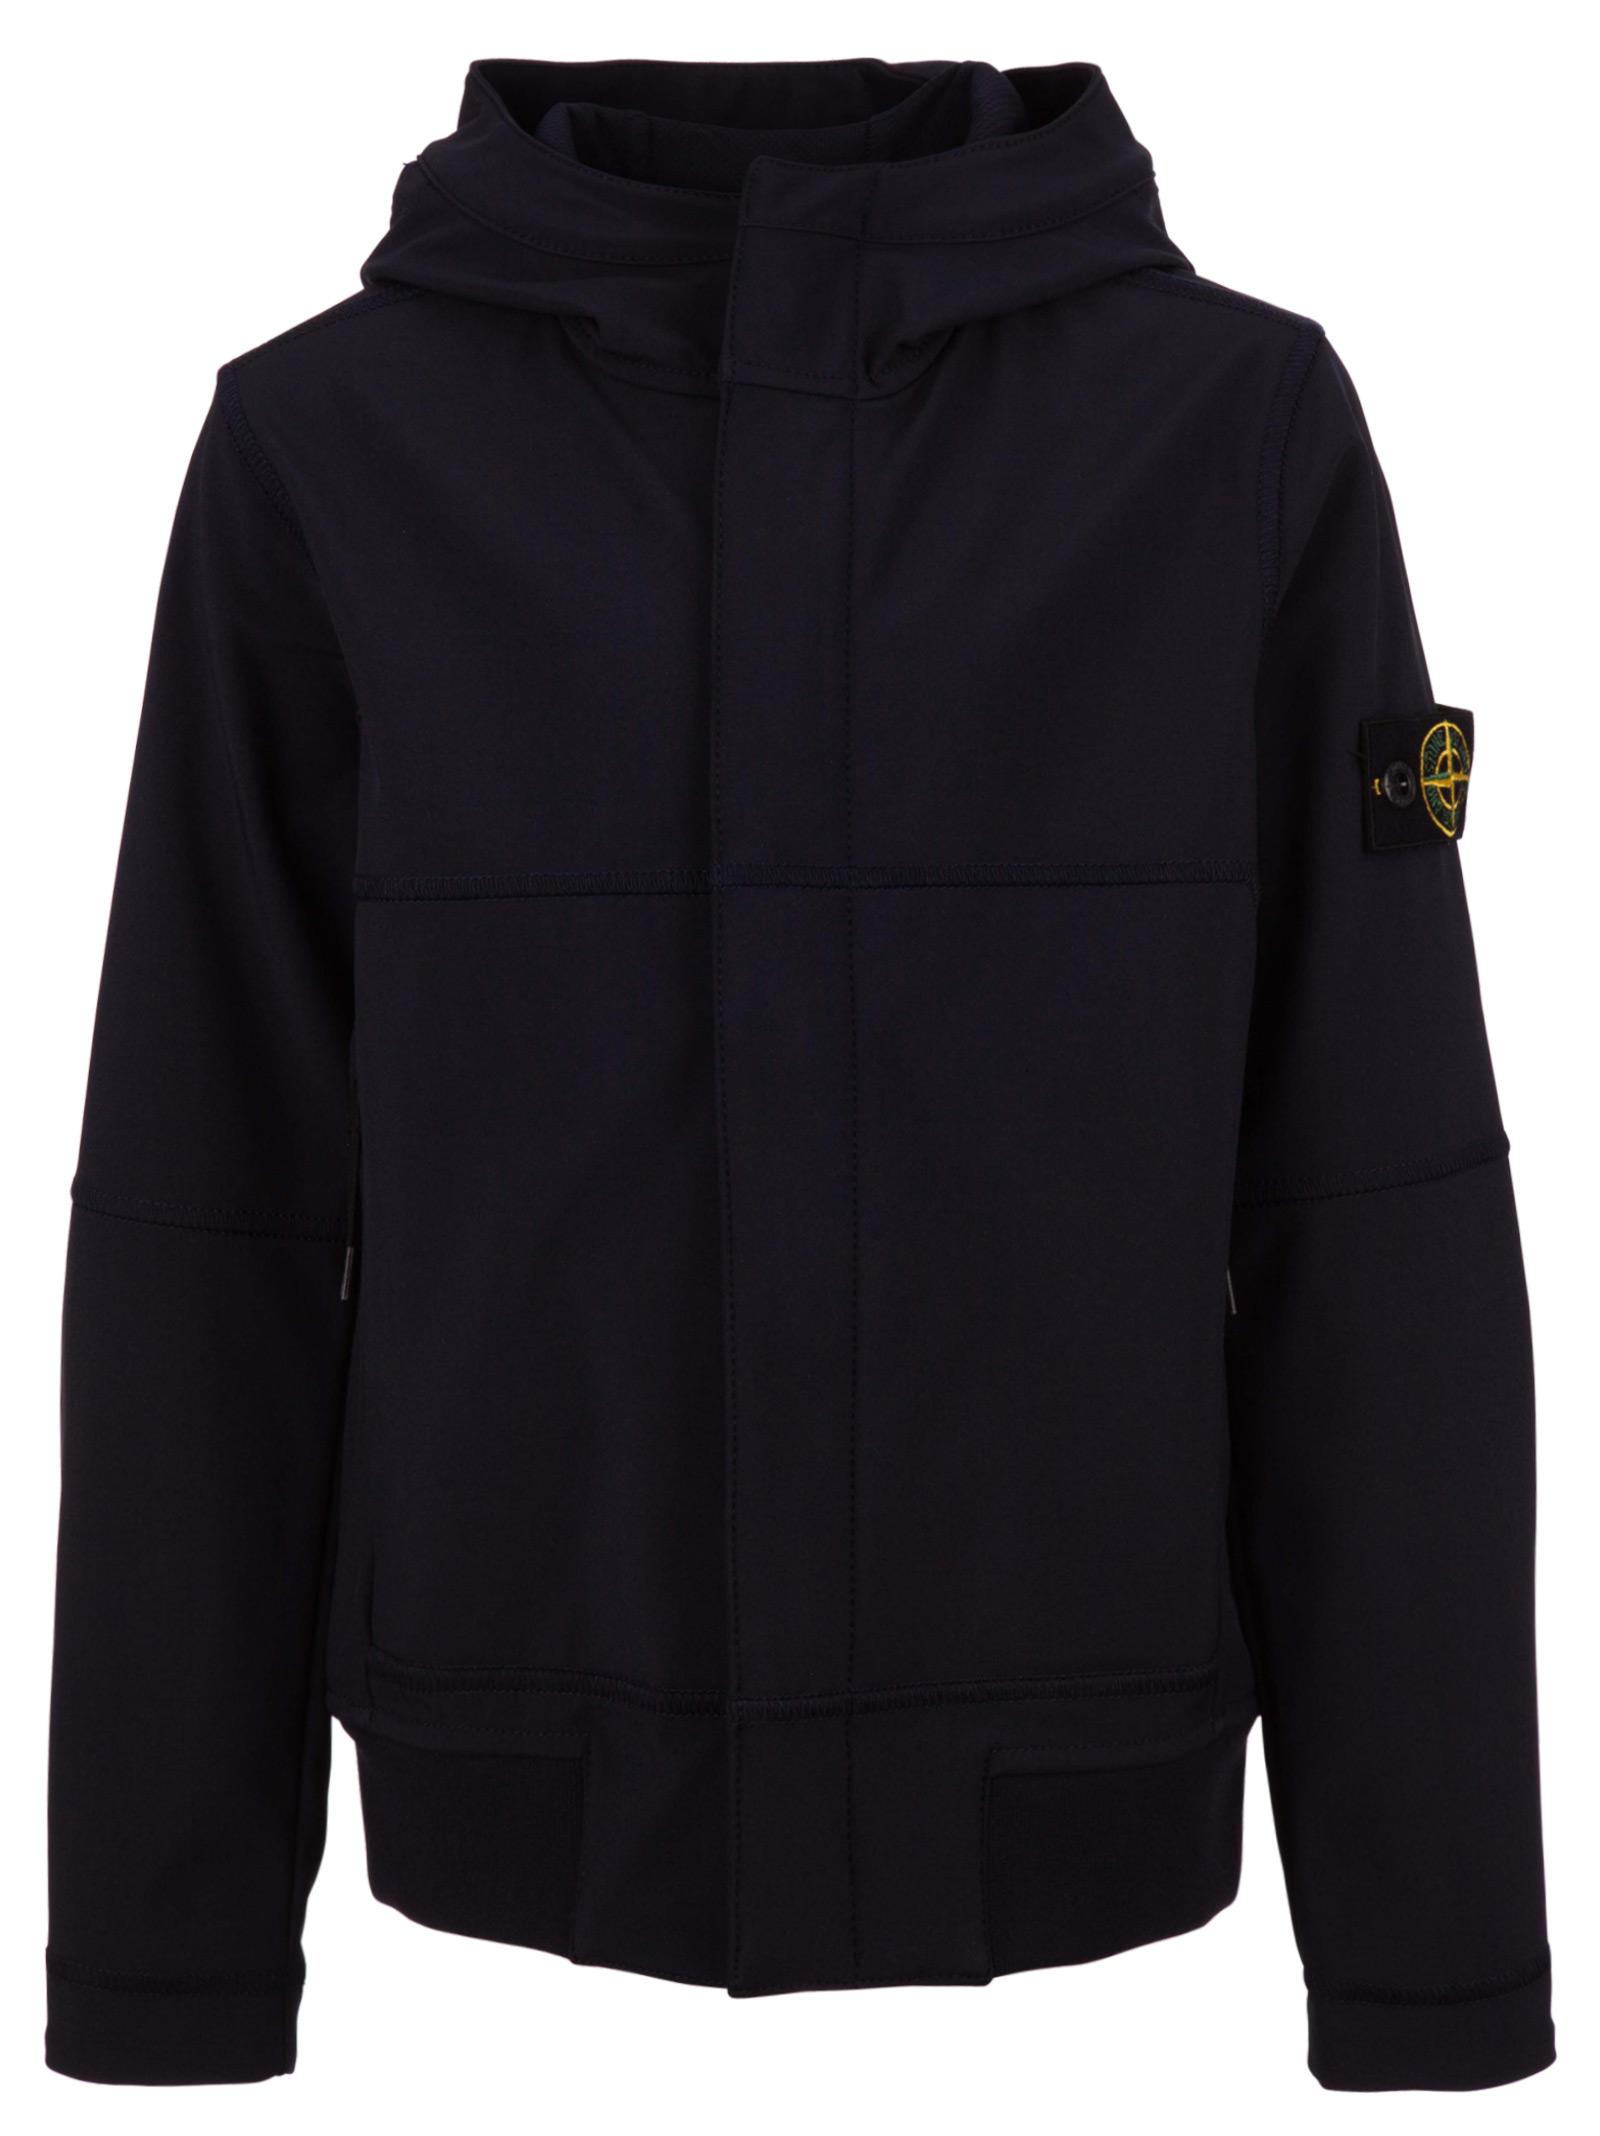 a6170da236 Stone Island Kids jacket